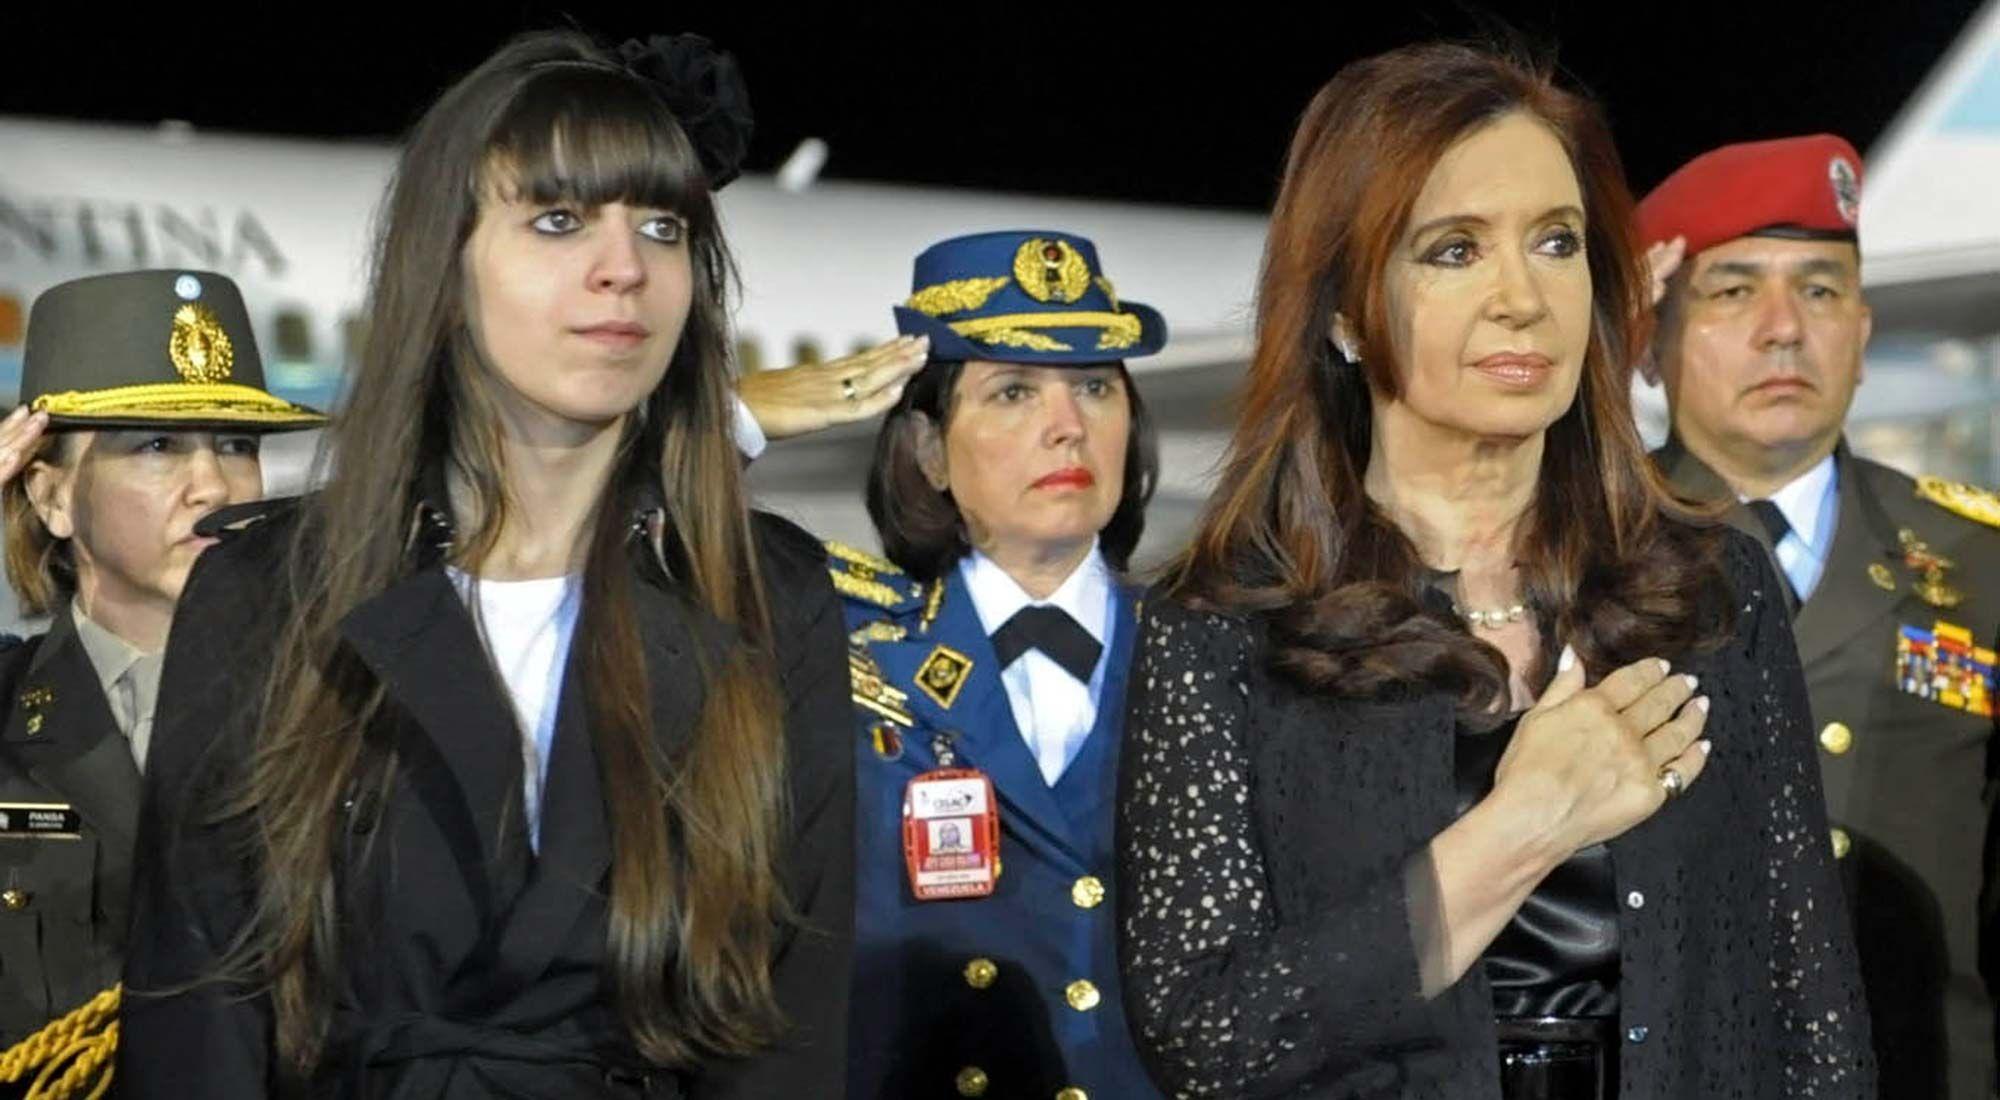 La ex presidenta Cristina Fernández y su hija Florencia Kirchner